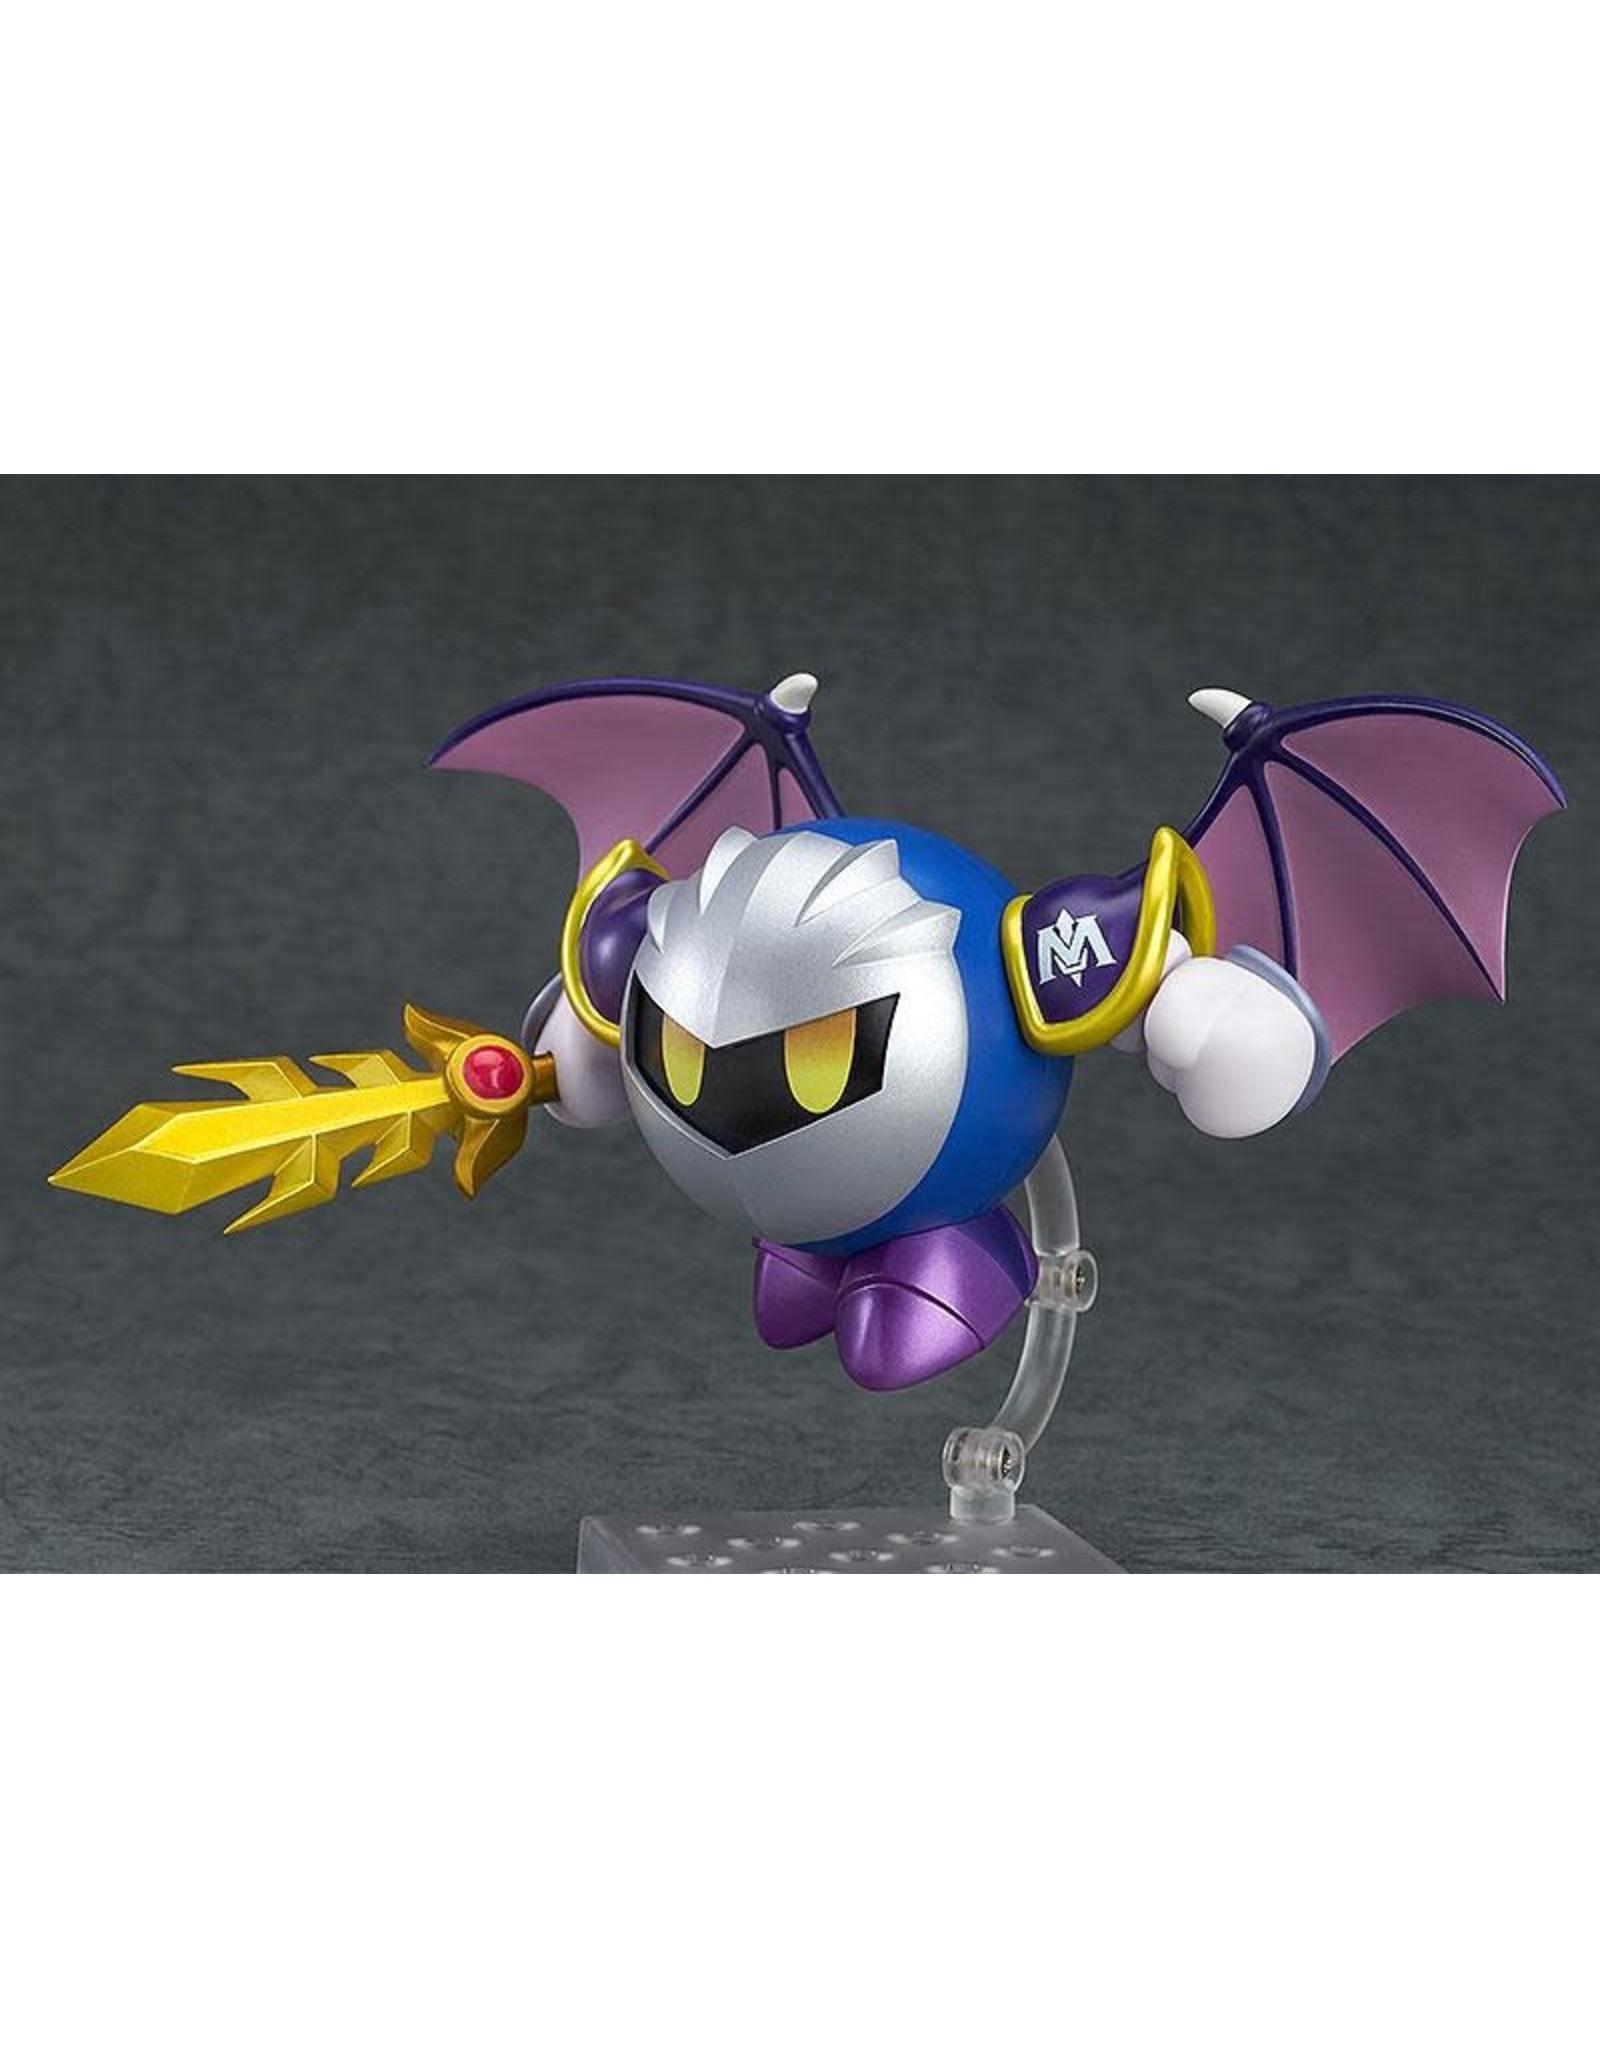 Kirby: Meta Knight - Nendoroid 669